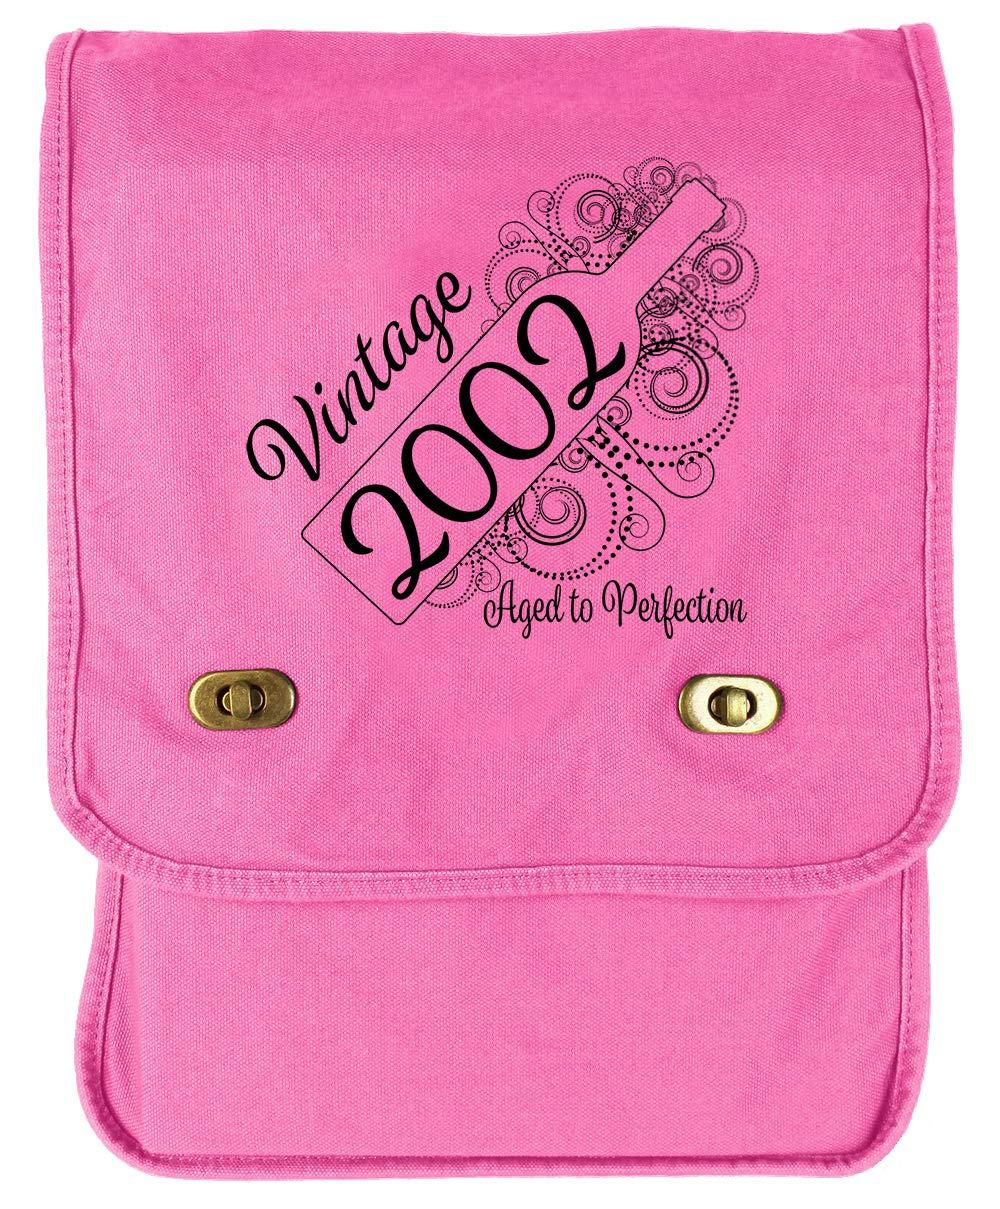 Aged Like a Fine Wine Flamingo Raw Edge Canvas Messenger Bag Tenacitee Born in 2002